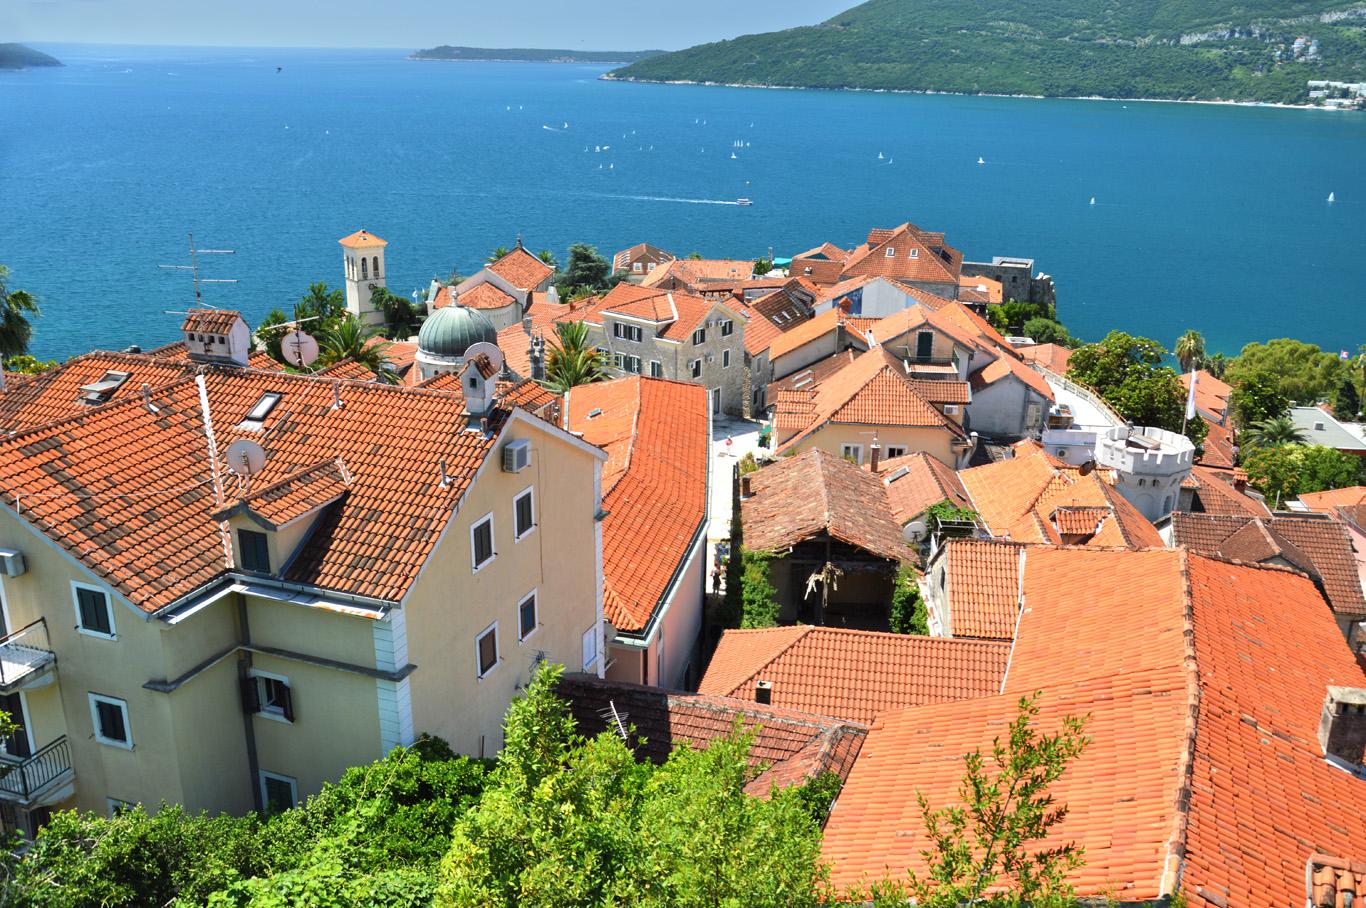 Red roofs of Herceg Novi